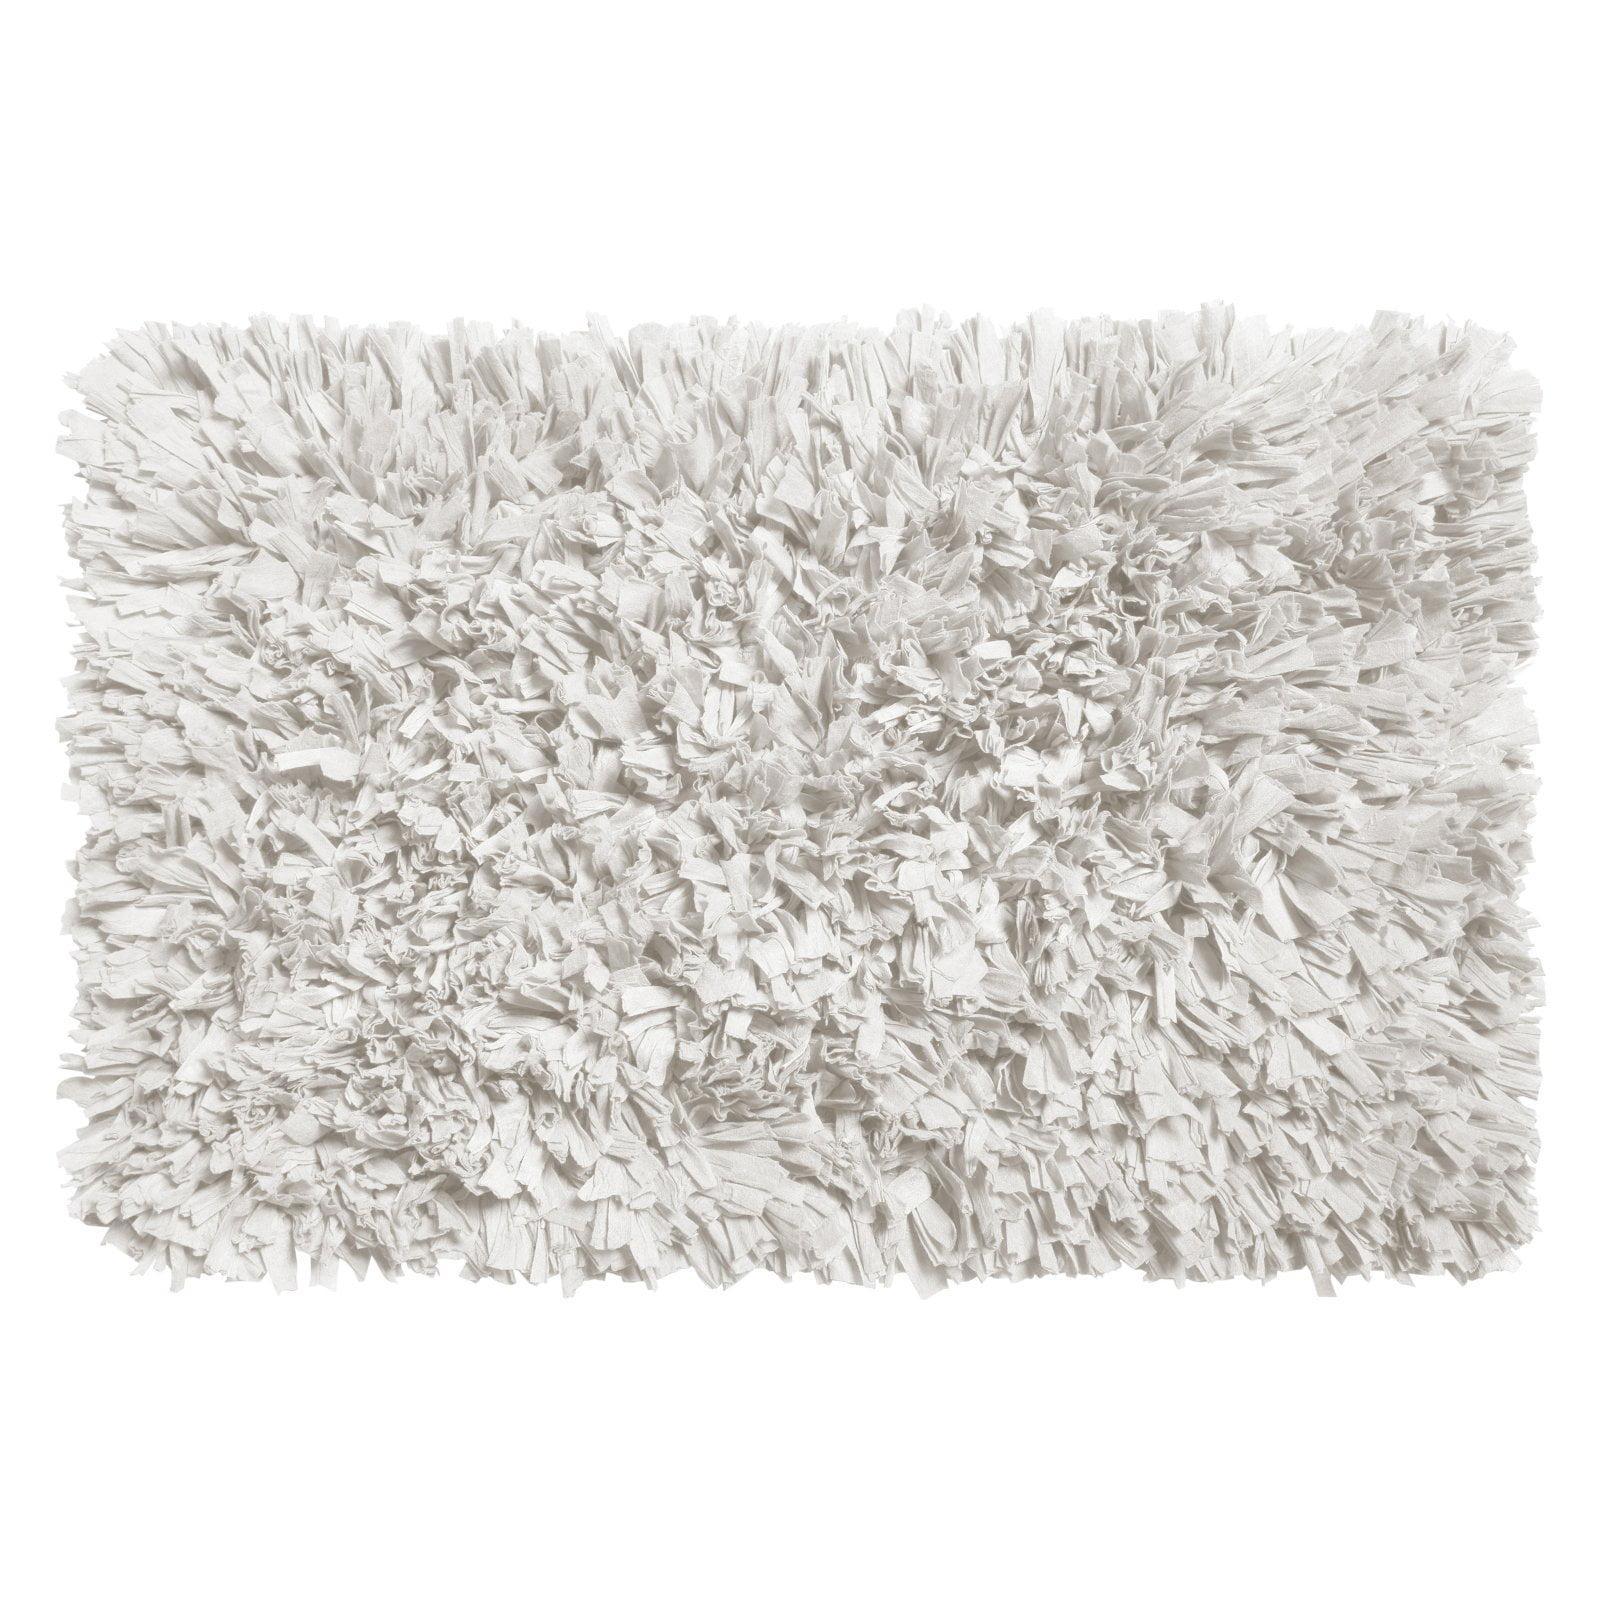 Soft Paper Cotton Poly Blend